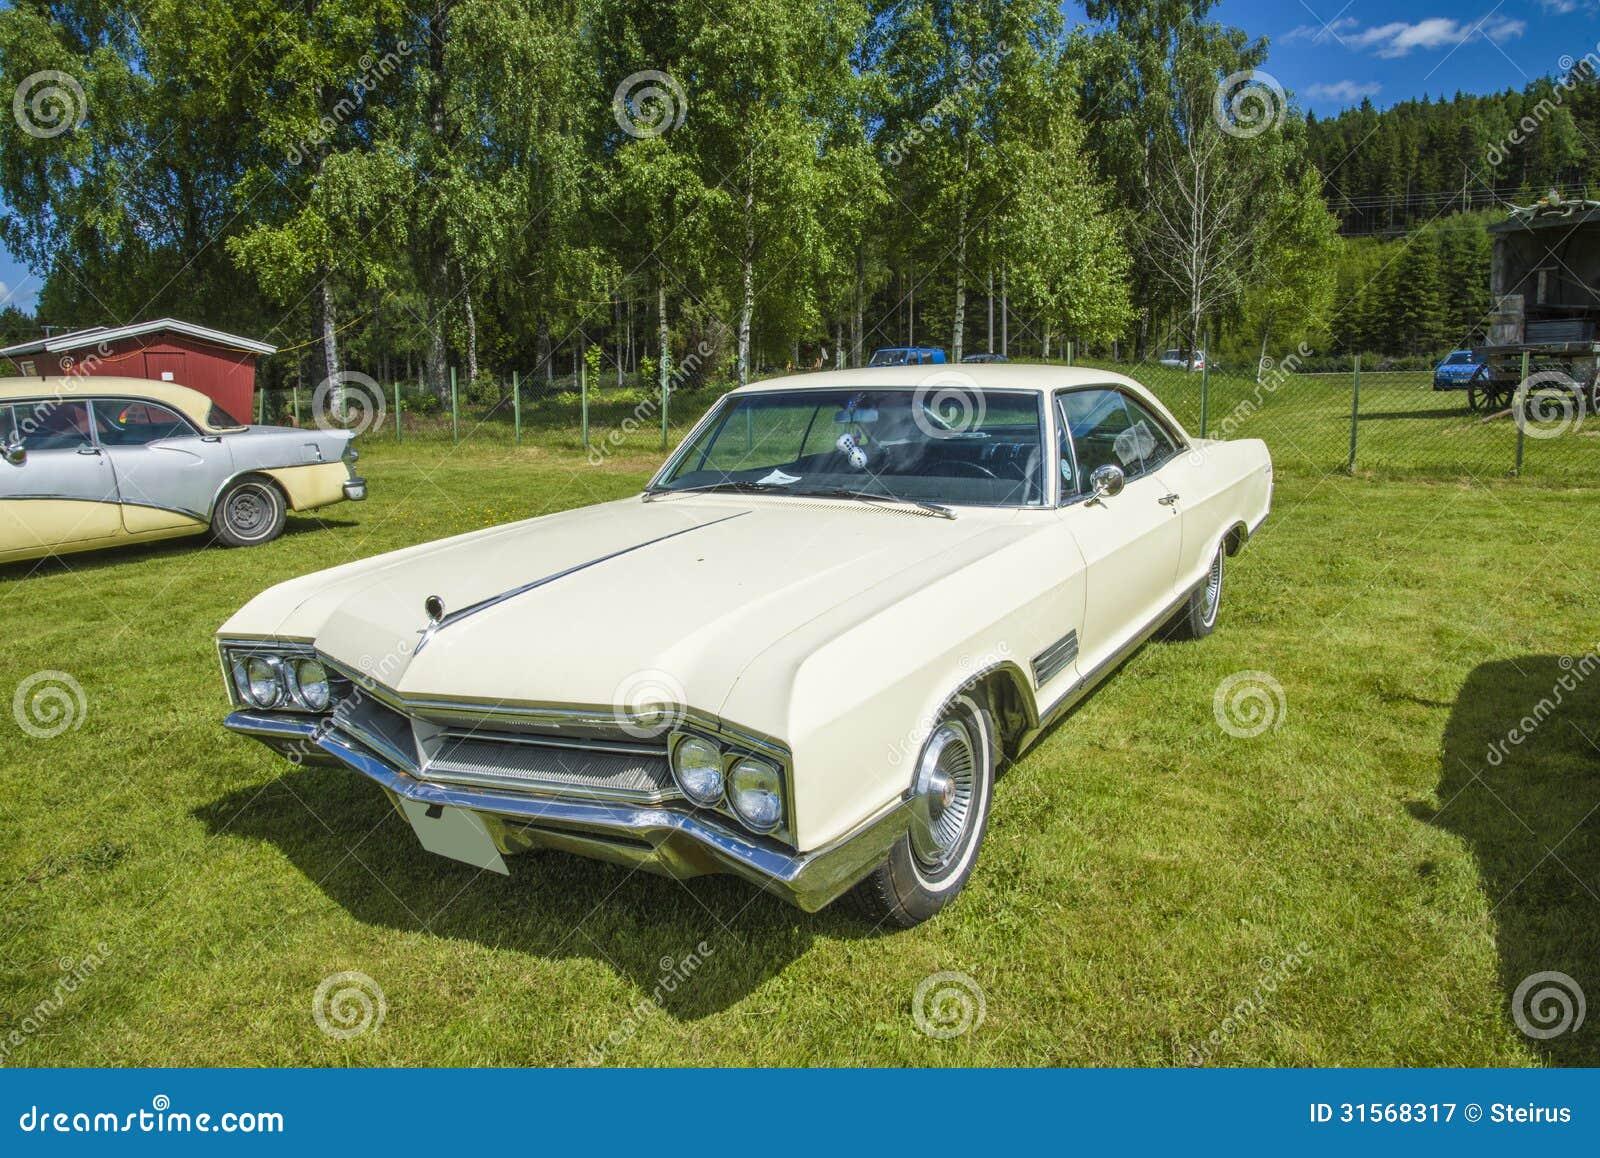 1966 Buick Wildcat Stock Image Of Shiny Auto 31568317 1951 Skylark Convertible For Sale